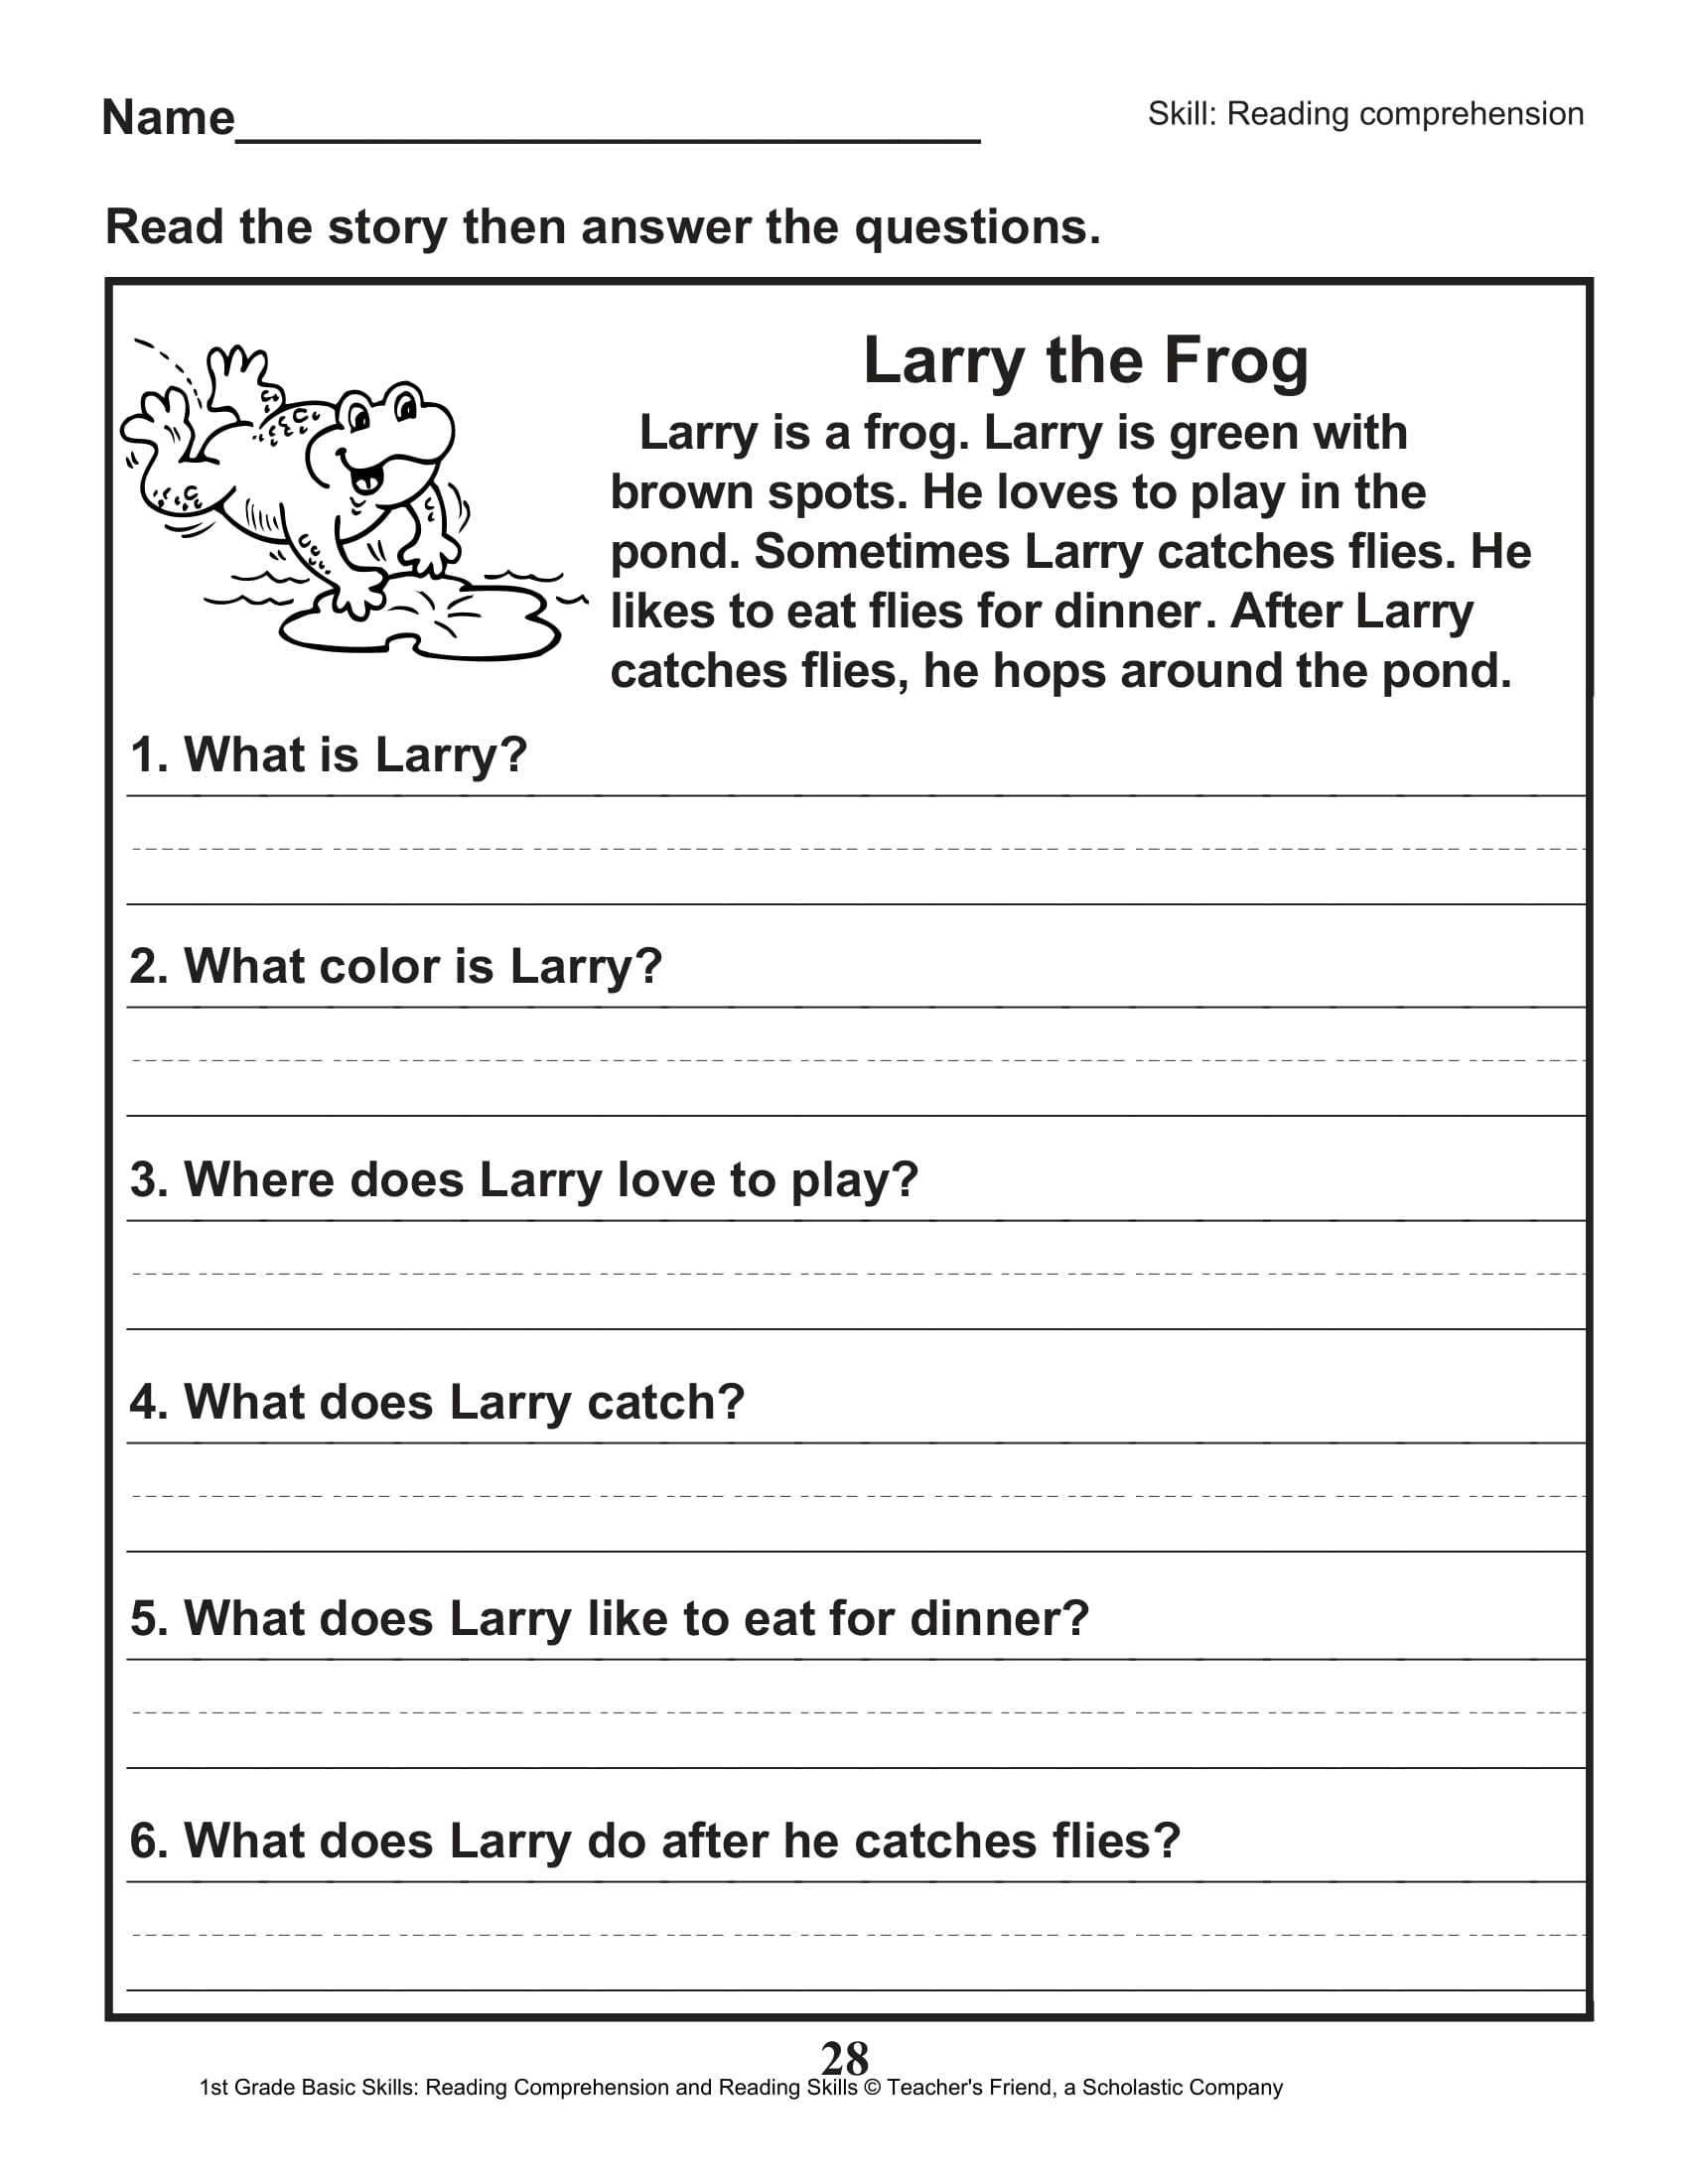 Scholastic 1st Grade Reading Comprehension Skills Worksheets 29